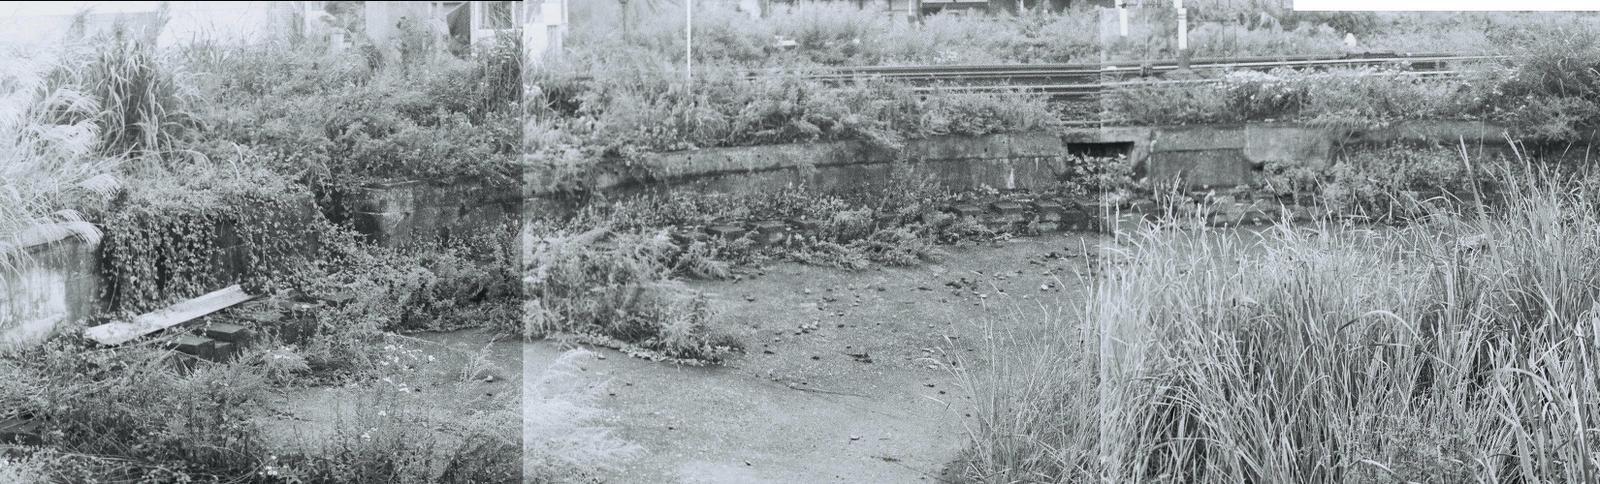 19790930